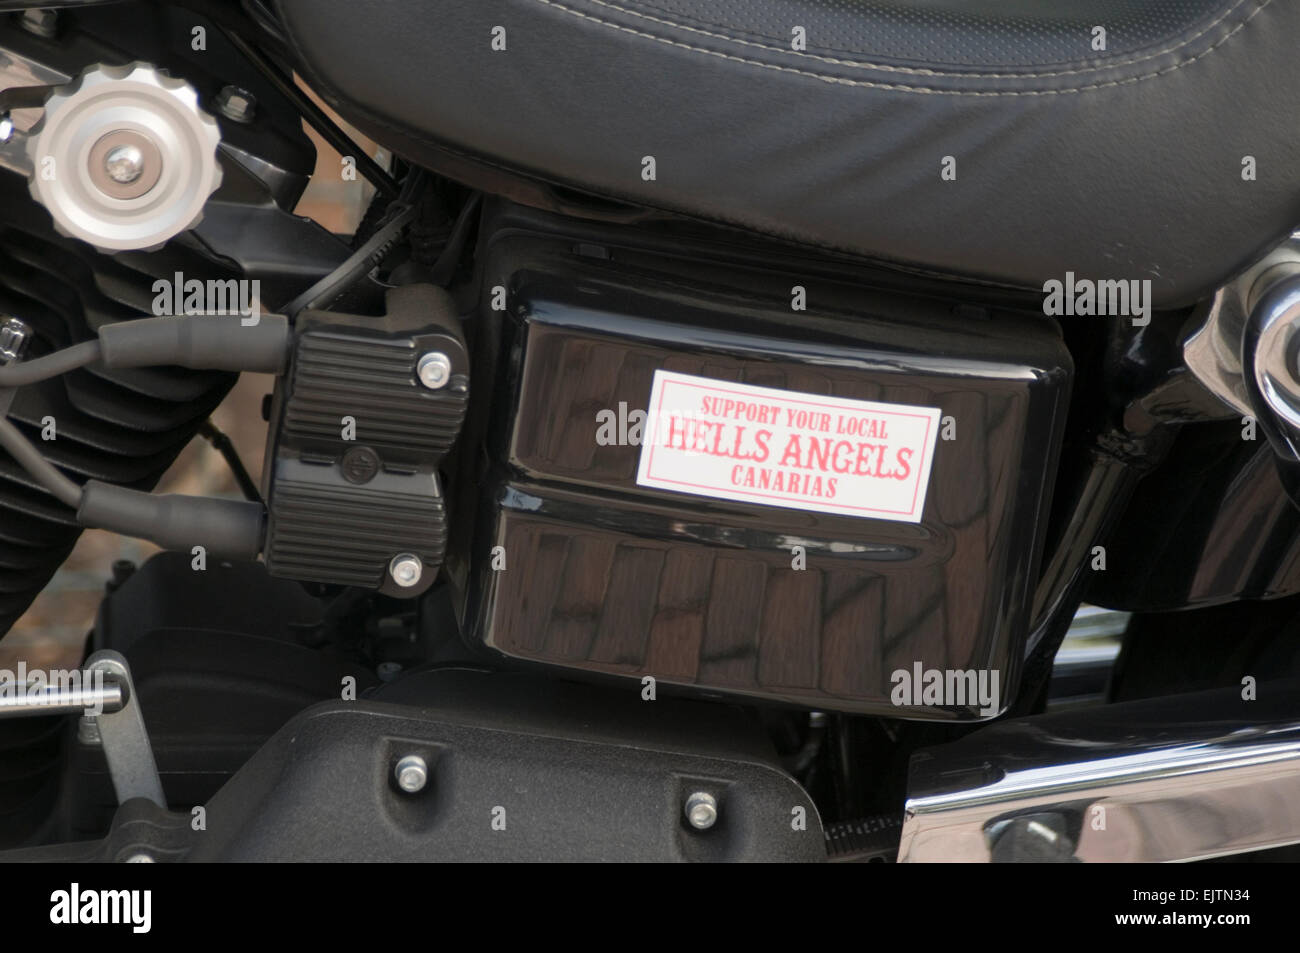 hells angels angel motorcycle gang gangs club clubs harley Davidson Davidsons sticker affiliation affiliations organized - Stock Image